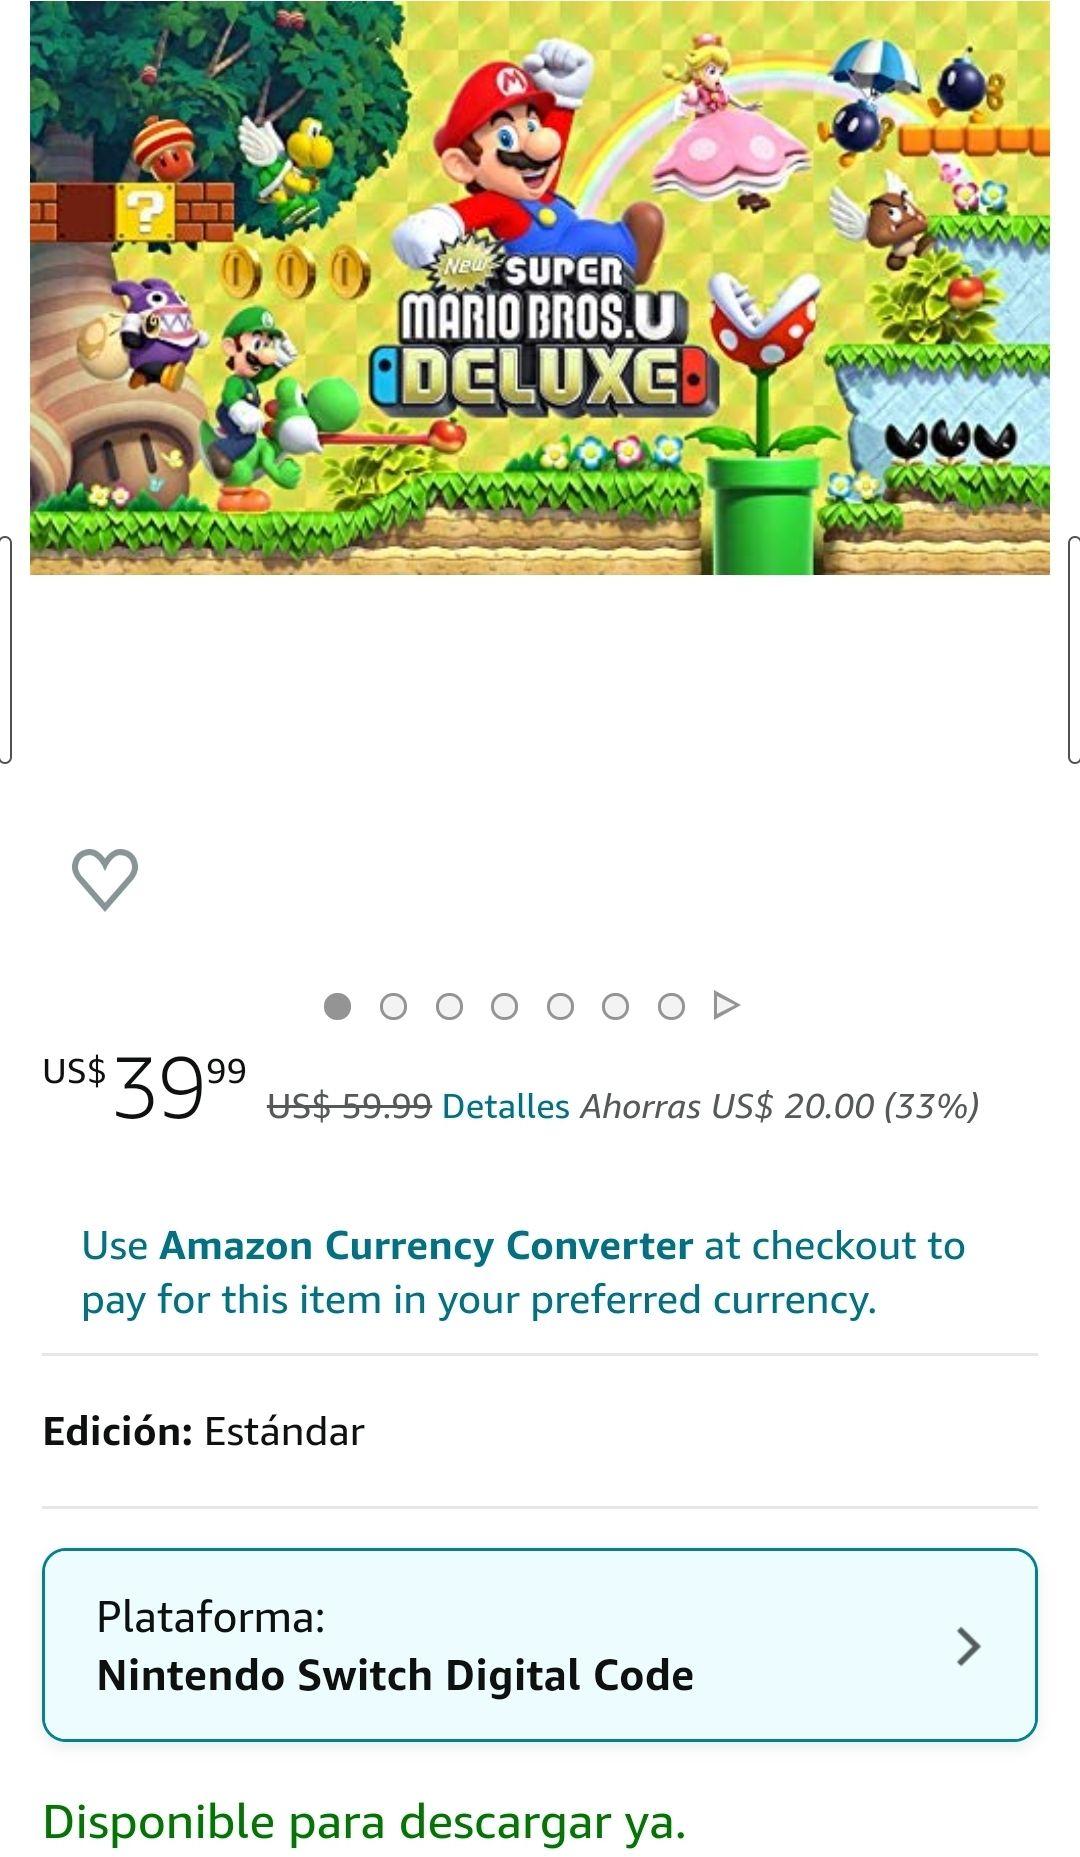 Amazon USA: Nintendo Switch: Super Mario Bros. U Deluxe Digital